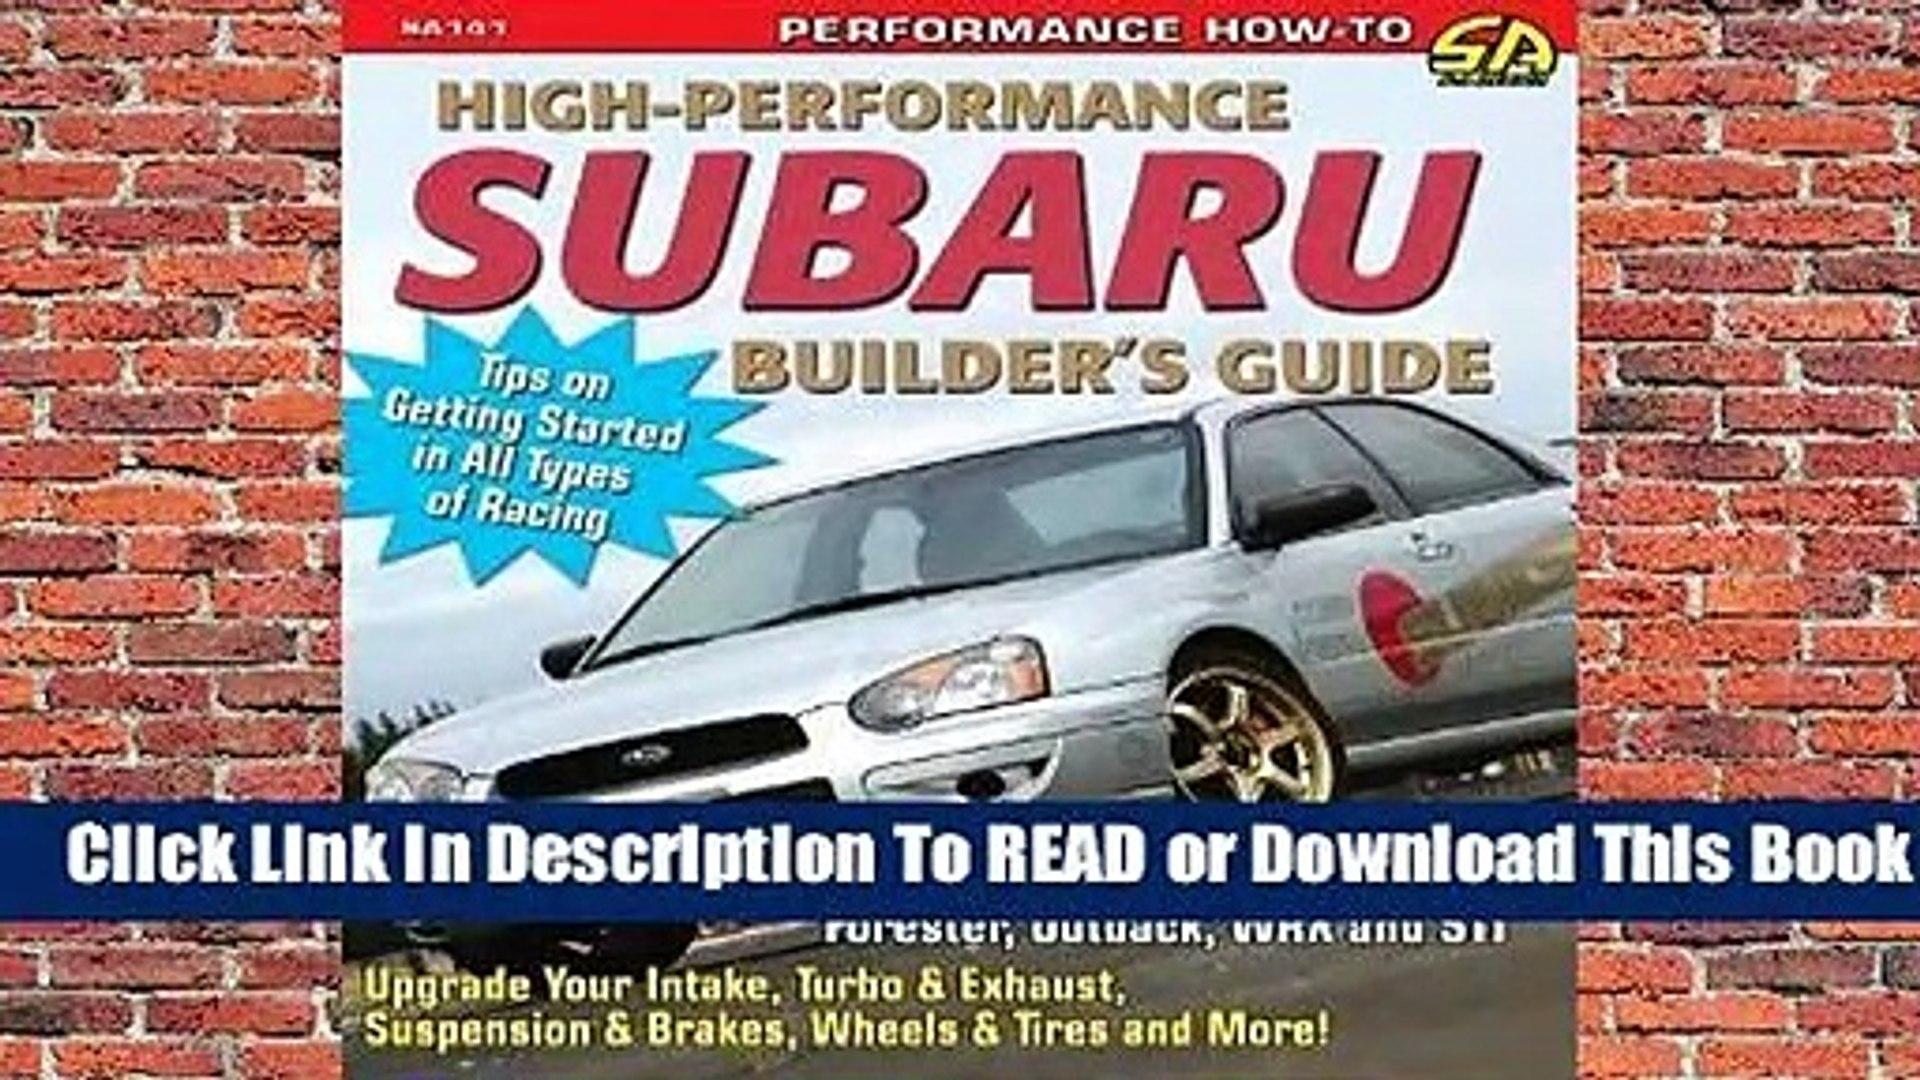 High-Performance Subaru Builders Guide